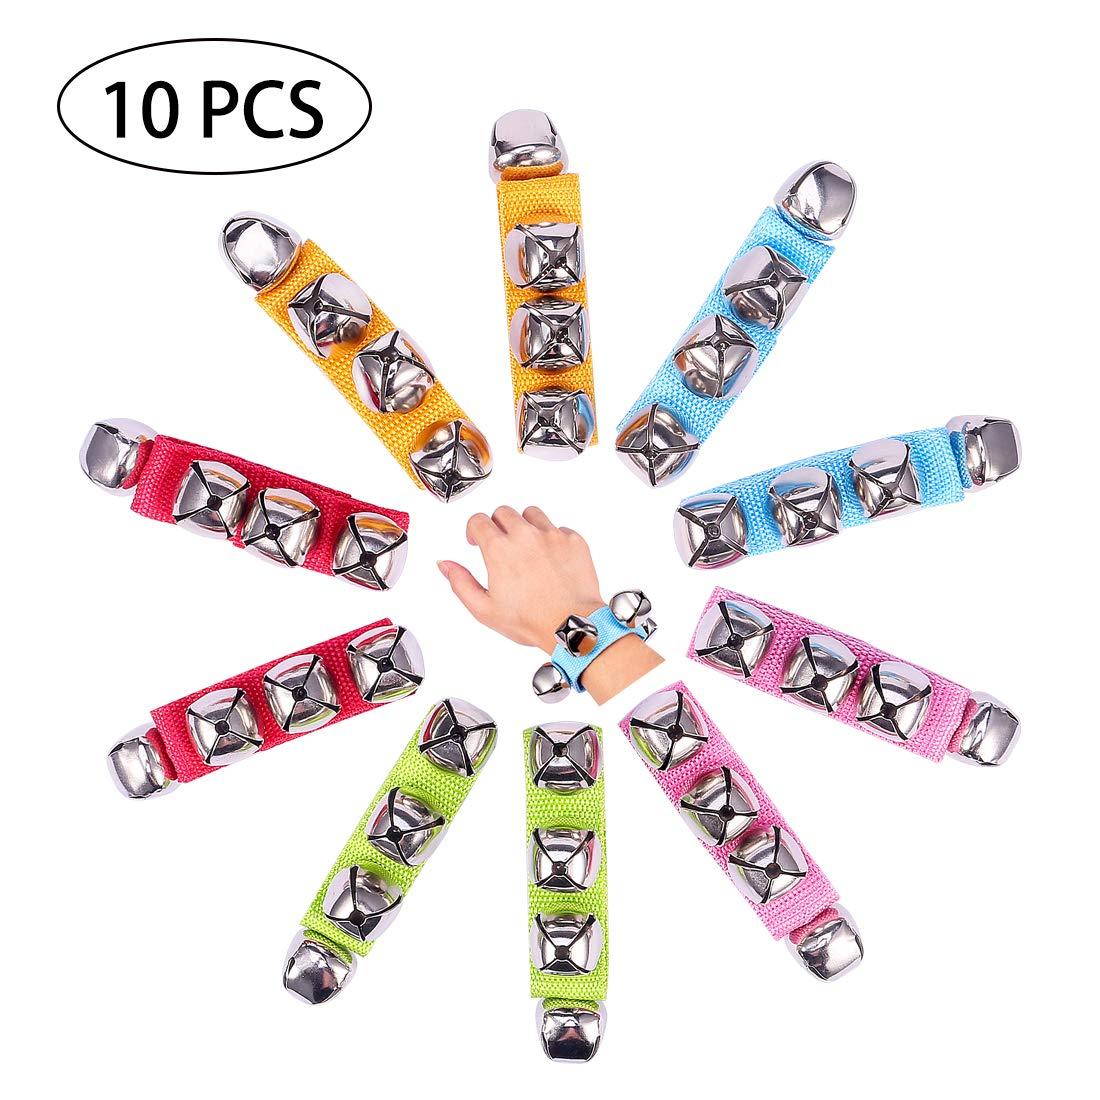 UMLIFE Band Wrist Bell 10 PCS Jingle Bells Musical Rhythm Toys Rattles Ring Bracelet for School Party